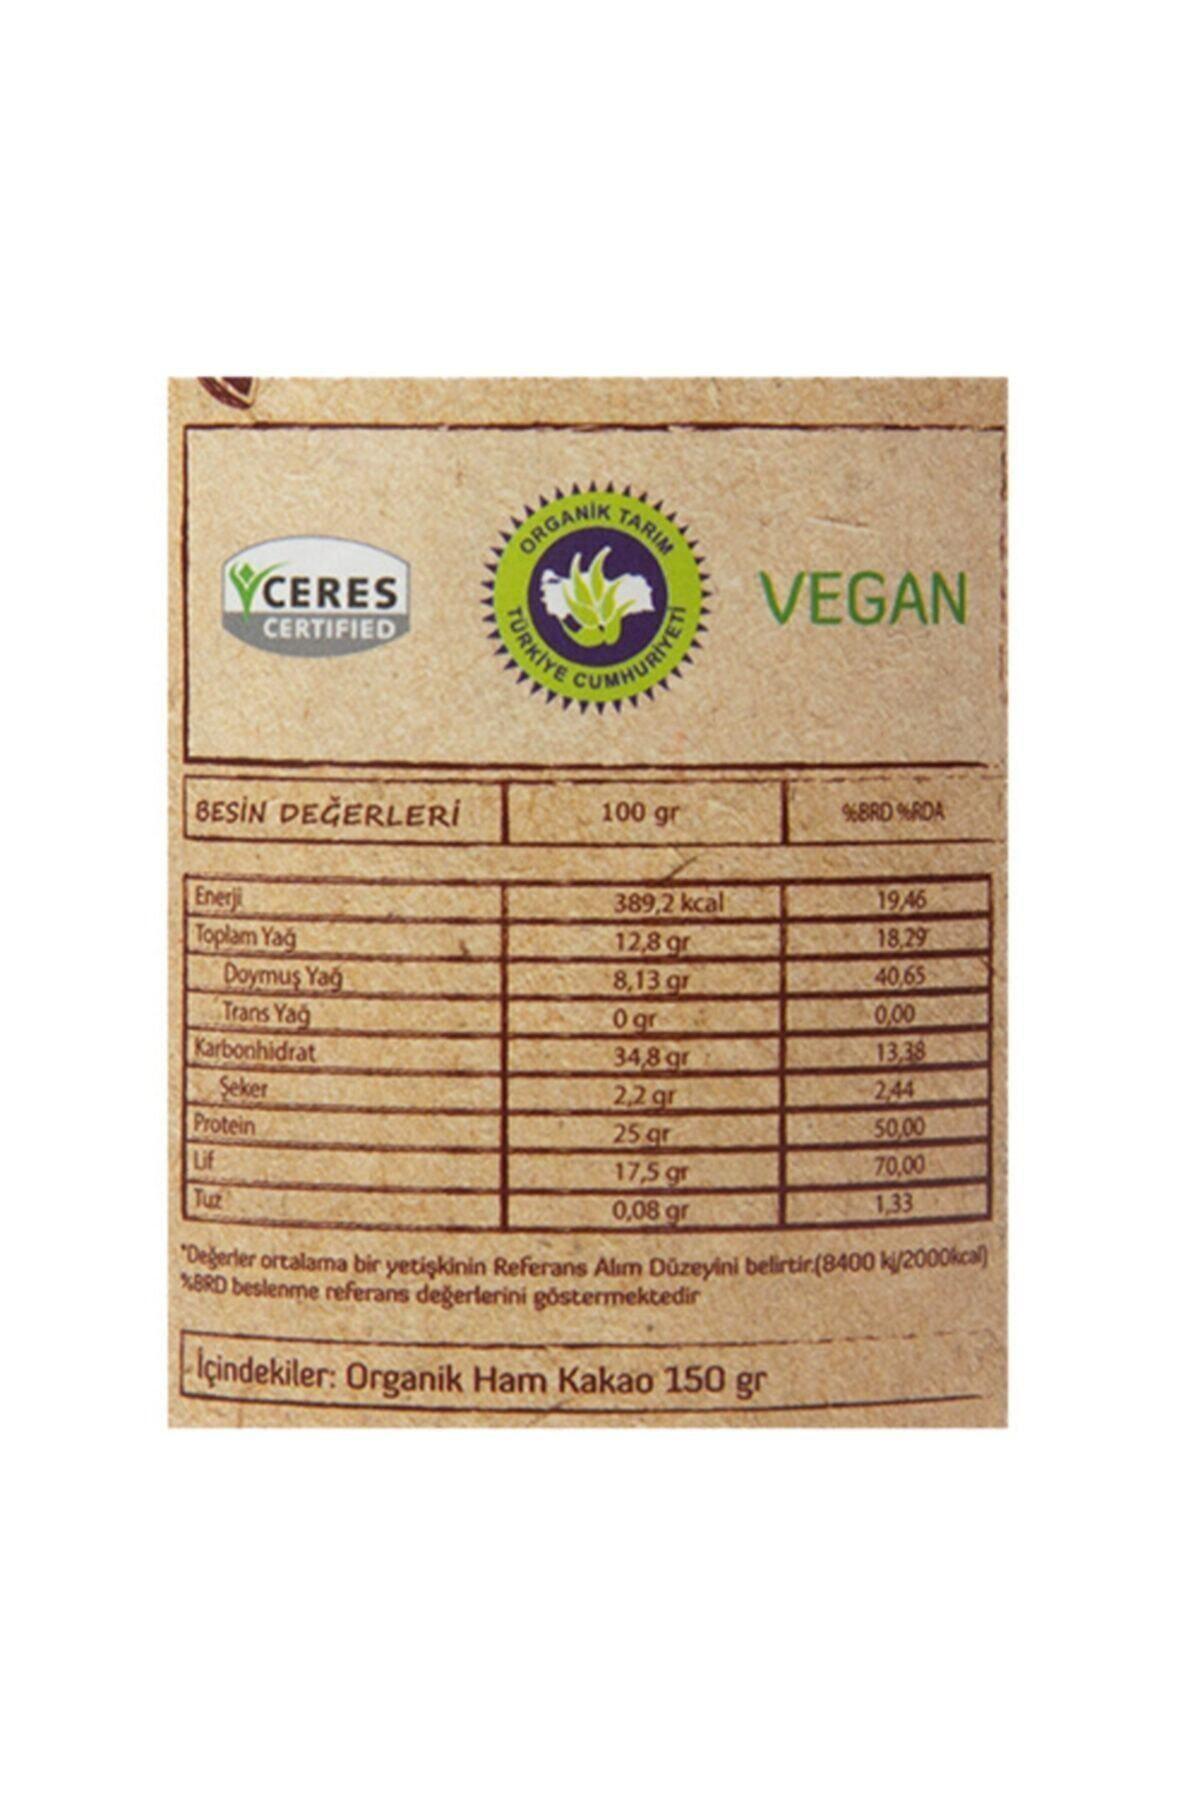 Güzel Gıda Organik Ham Kakao 150 gr 2